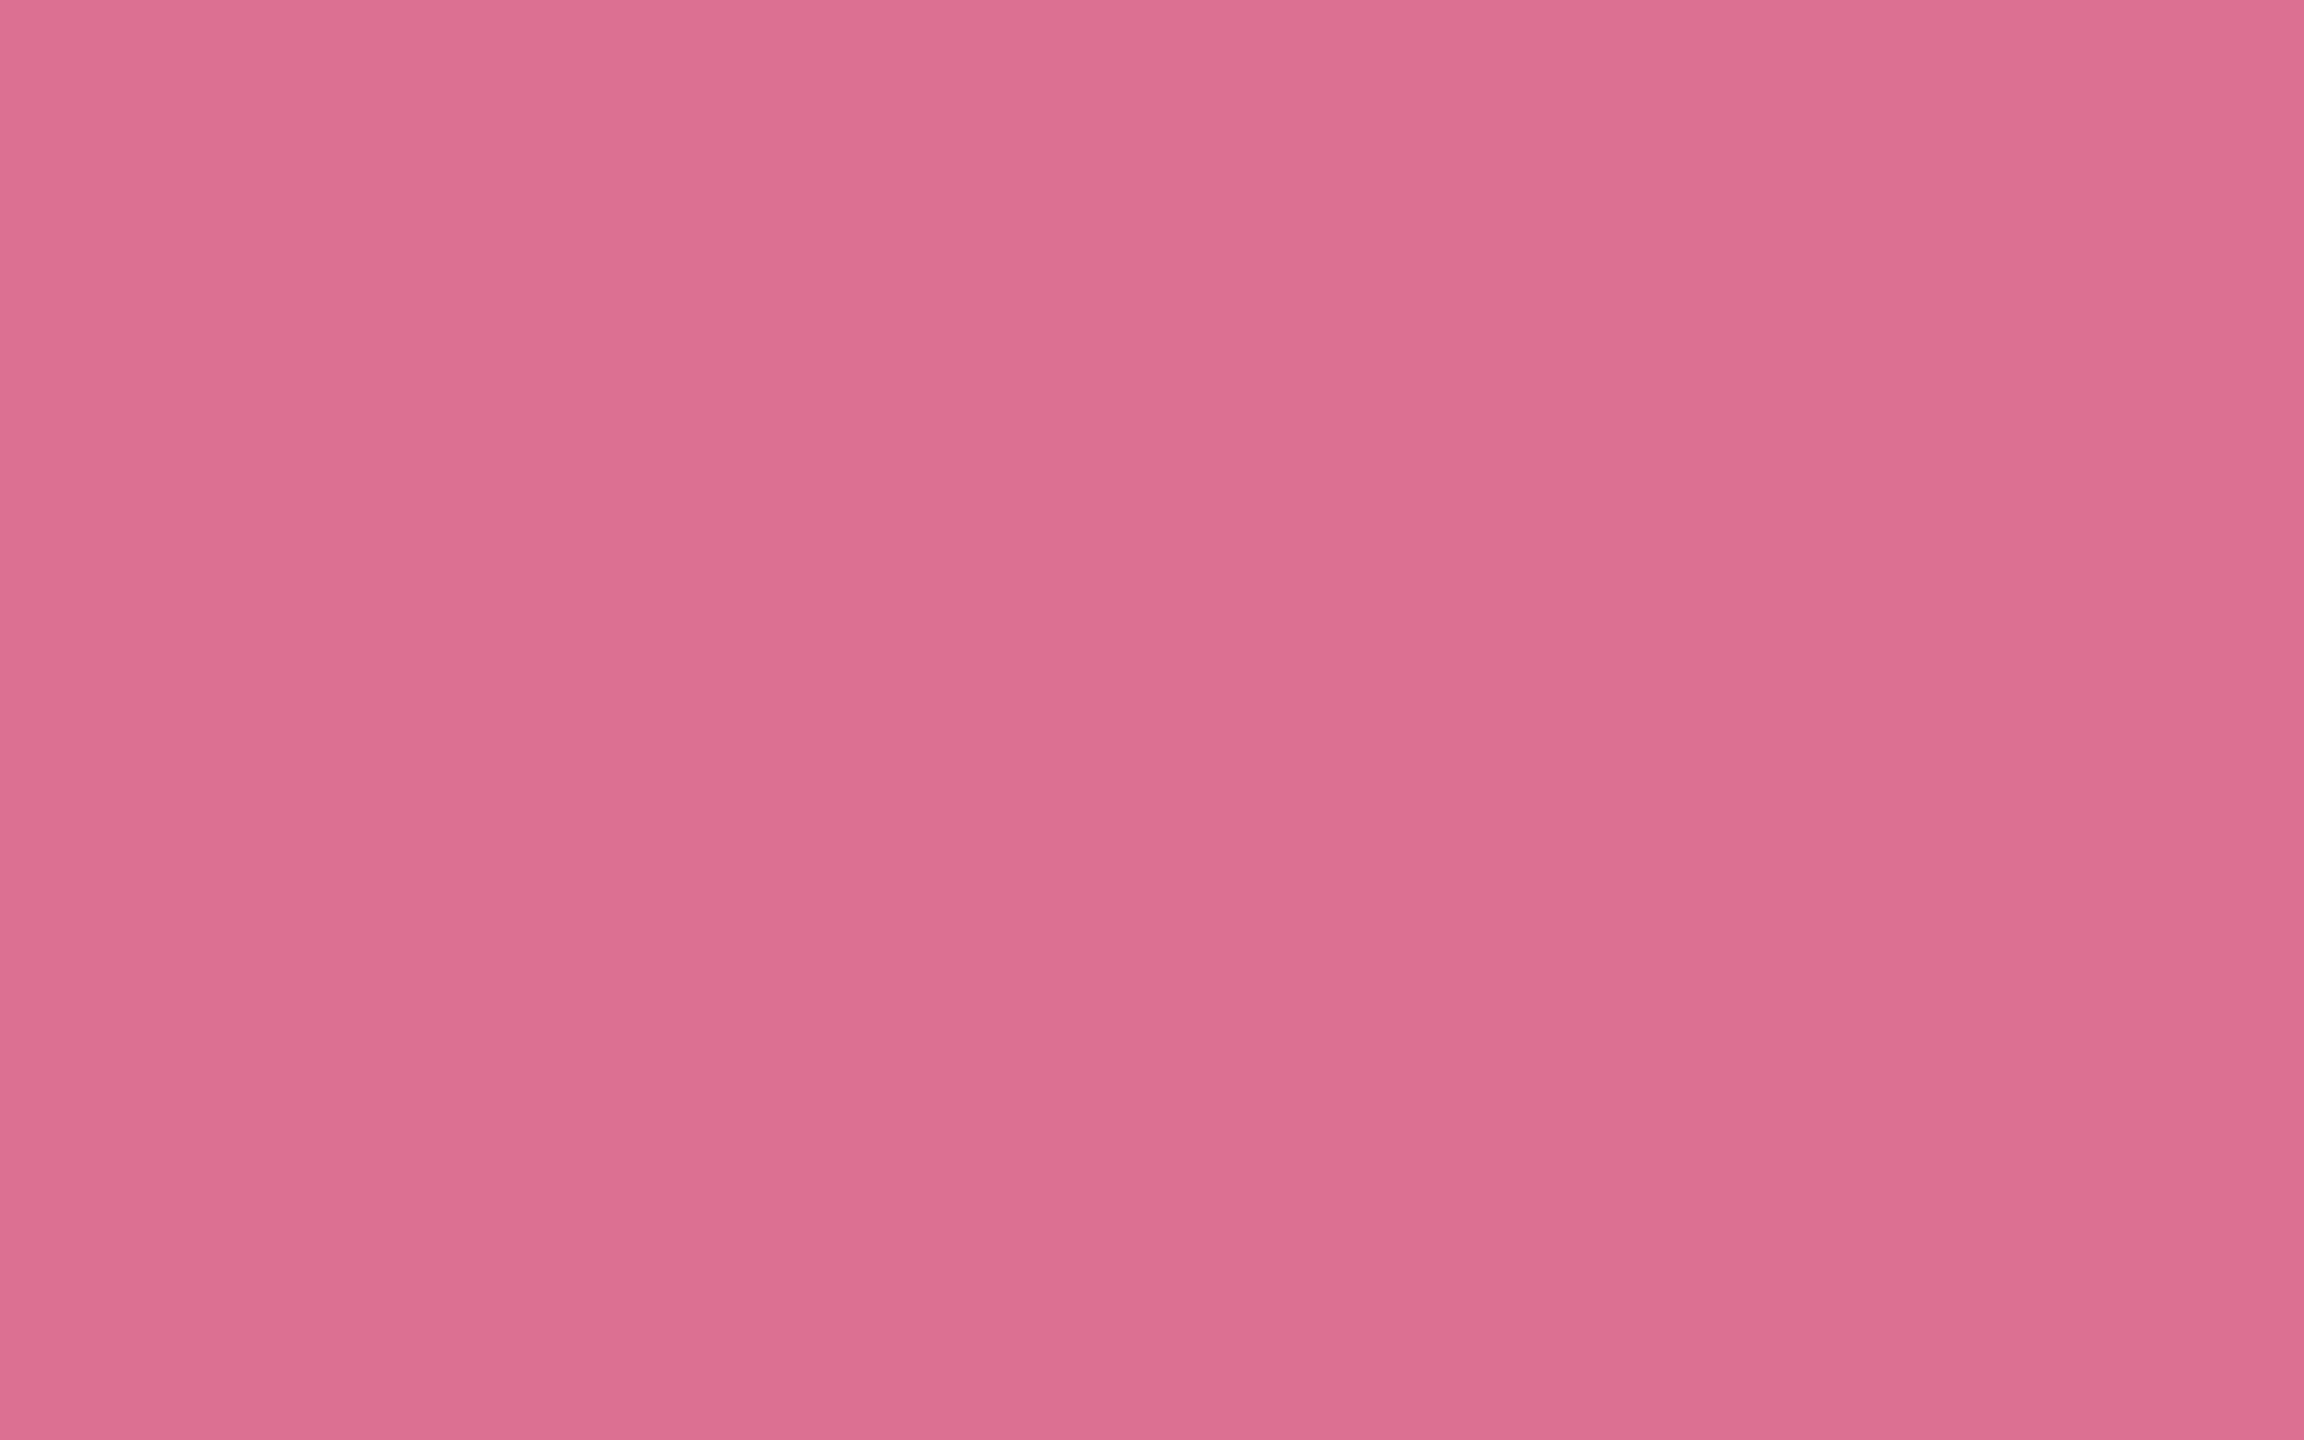 2304x1440 Pale Violet-red Solid Color Background